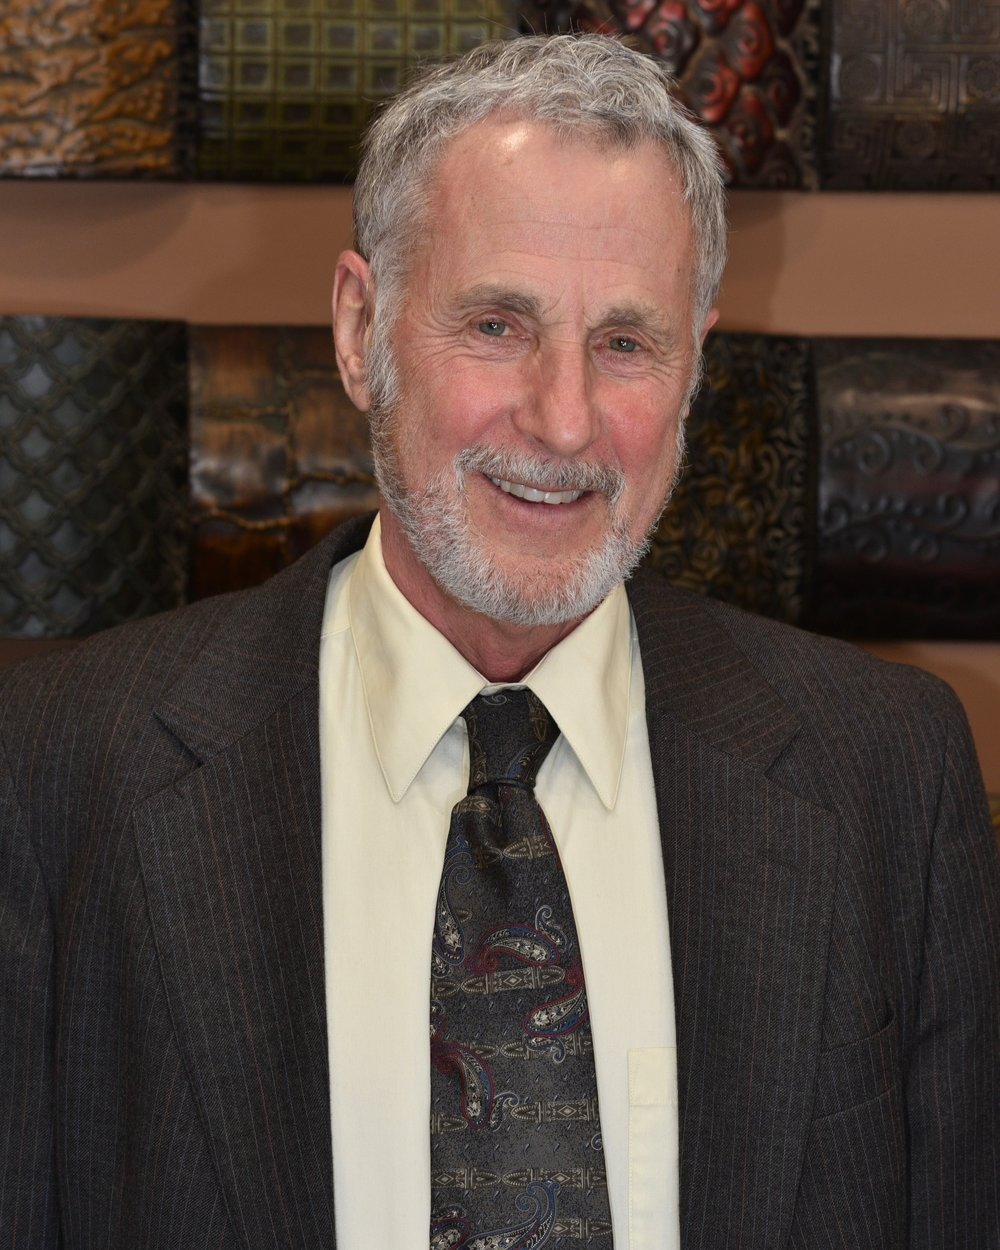 John Larson Title: Director of Operations Email:  john@safeharborestatelaw.com